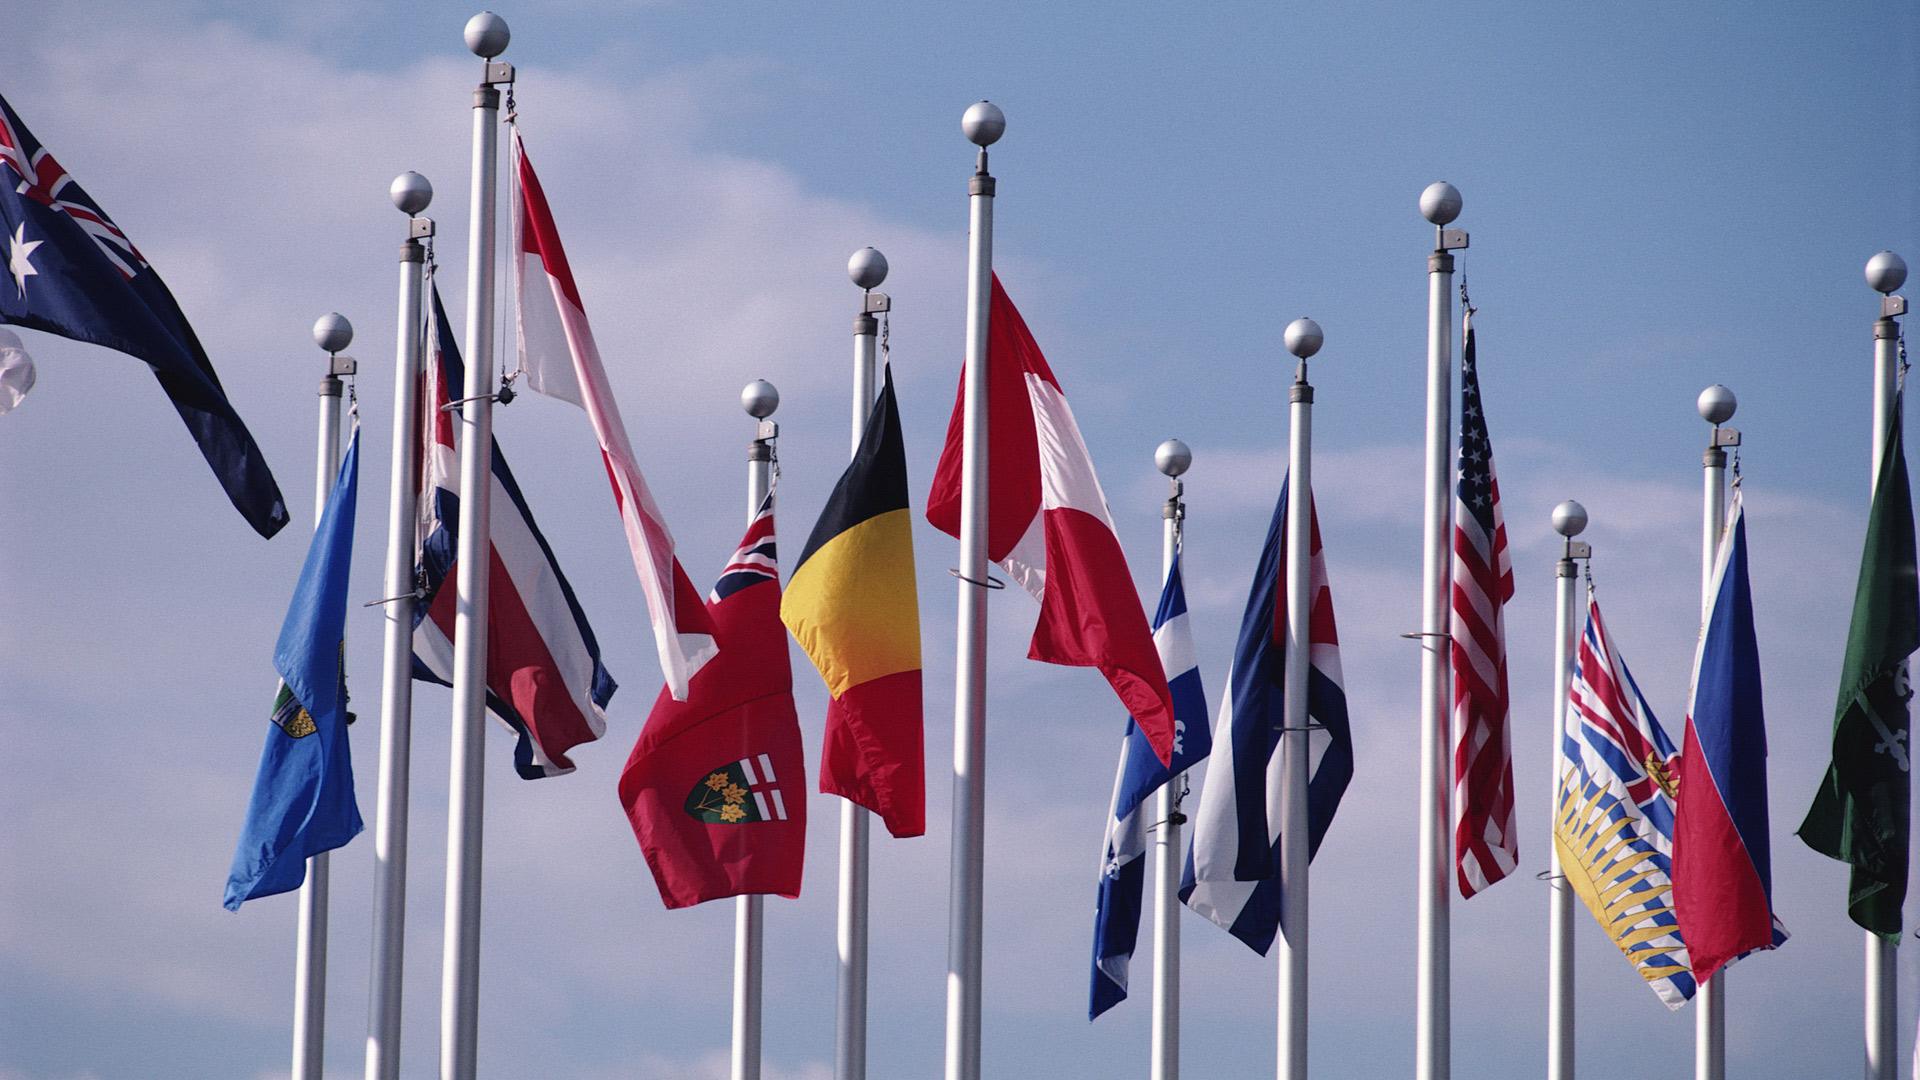 Флаги мира фото из альбома флаги